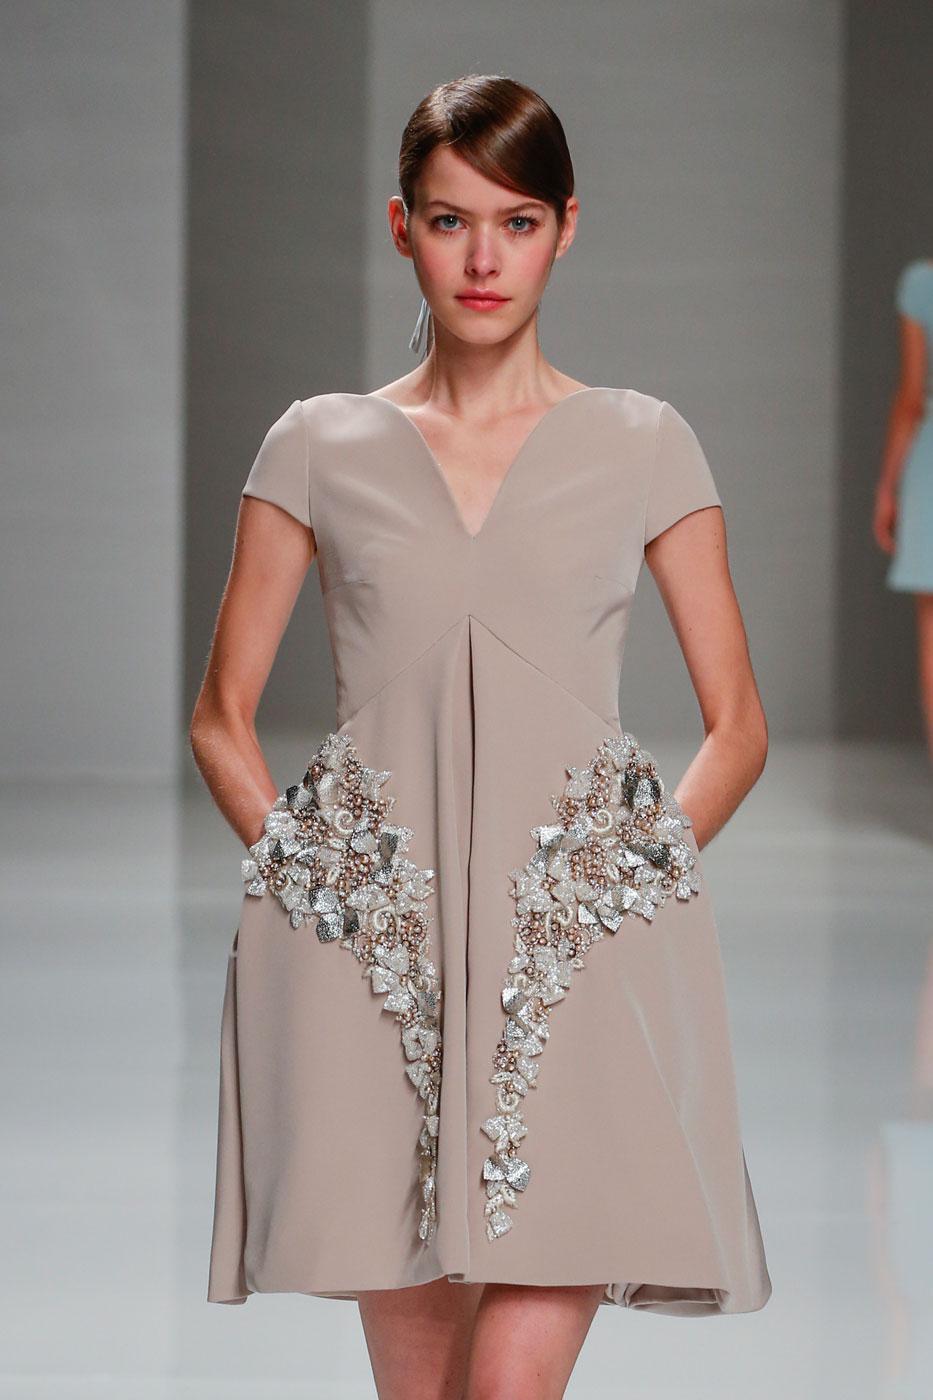 Georges-Hobeika-fashion-runway-show-haute-couture-paris-spring-2015-the-impression-30